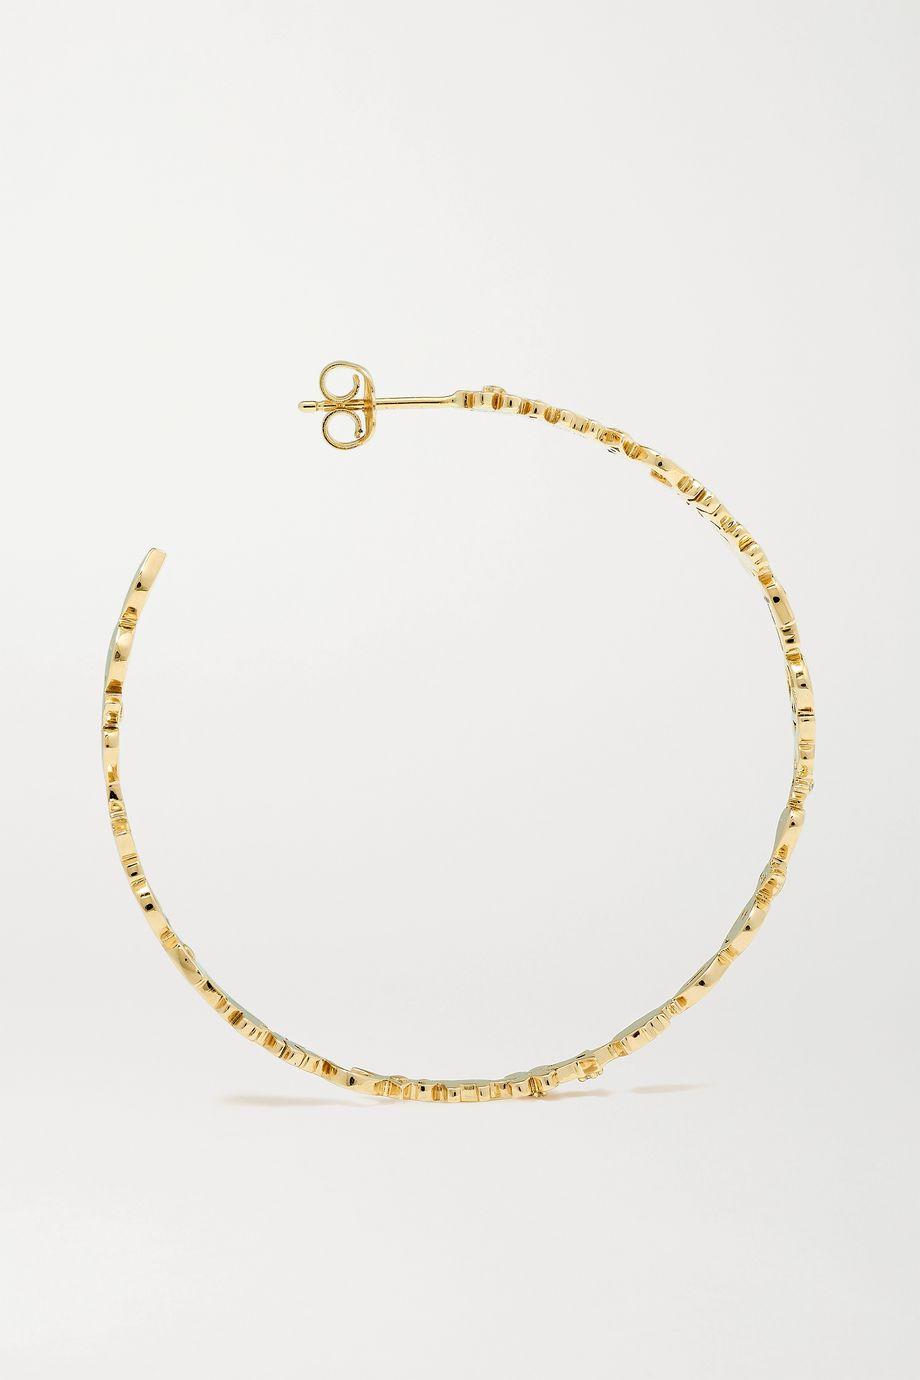 Sydney Evan Large Icon 14-karat gold diamond hoop earrings